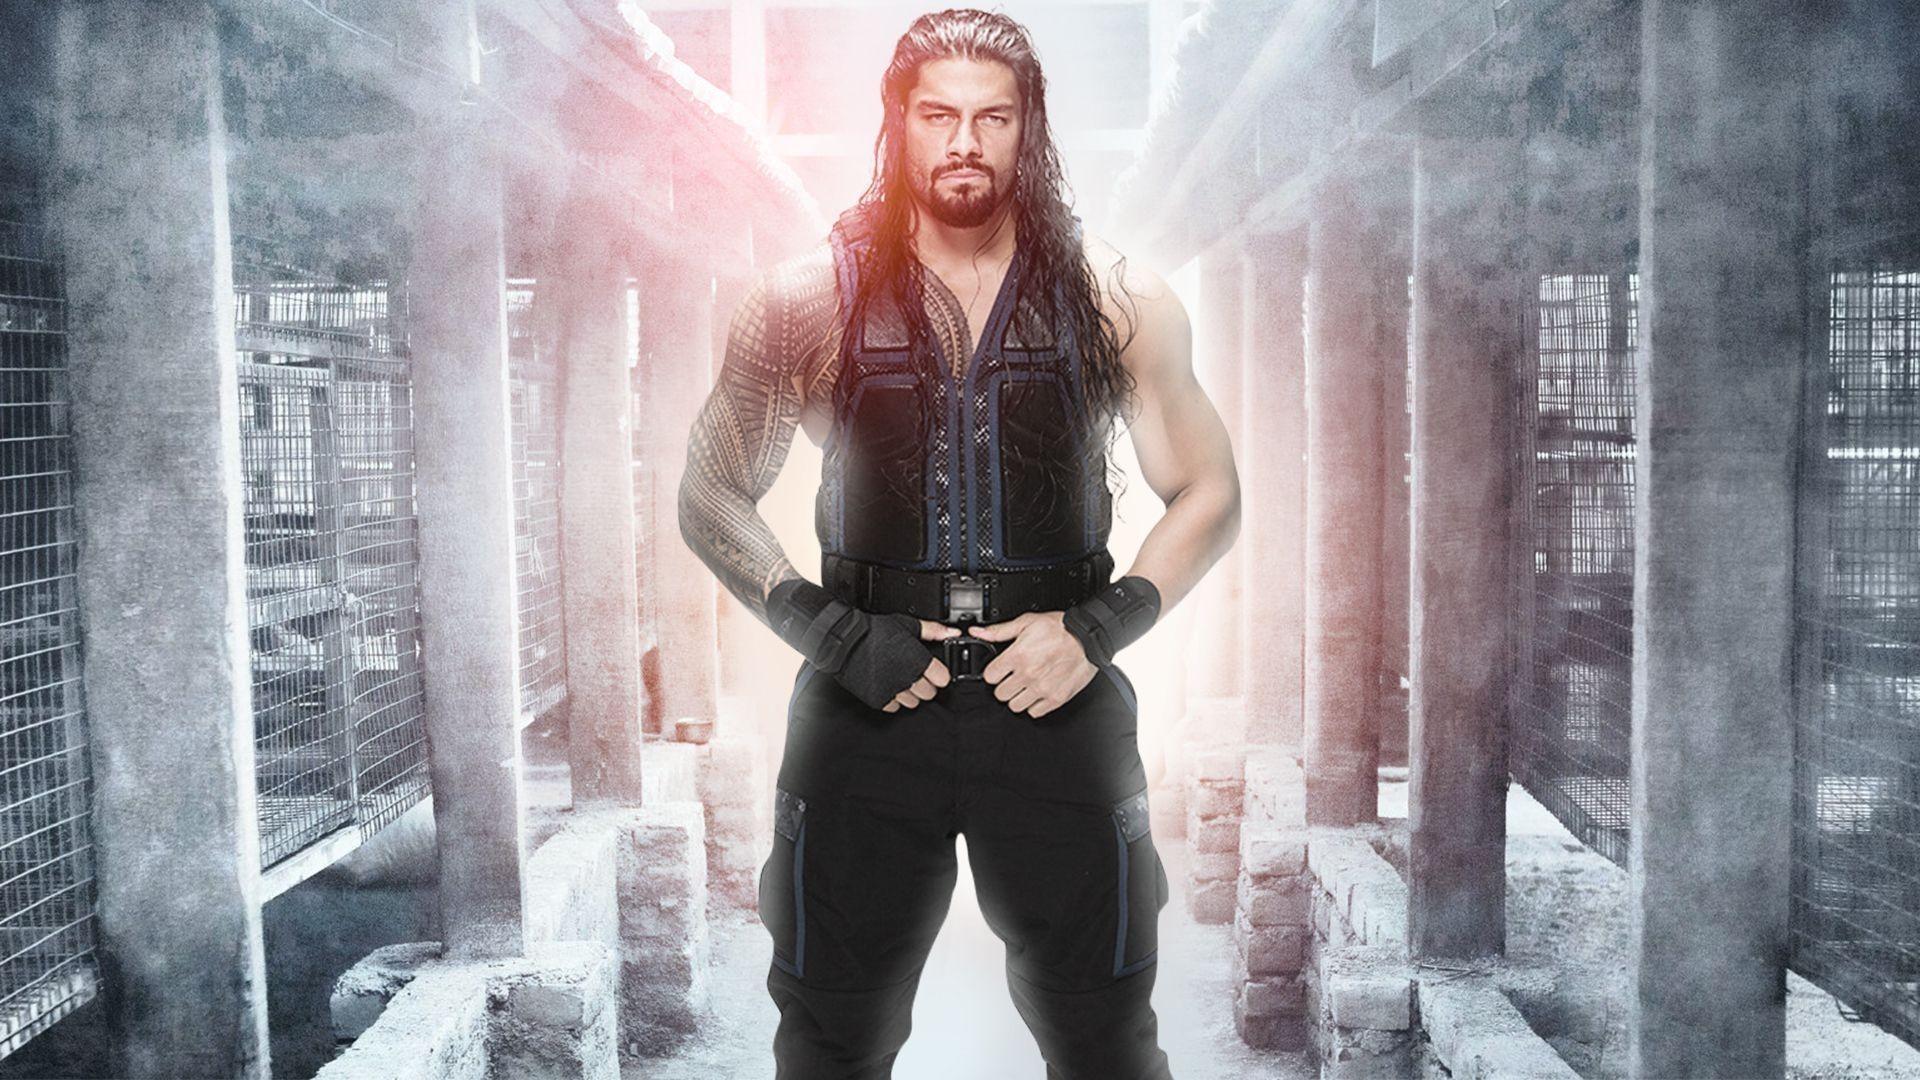 Roman Reigns hd wallpaper download